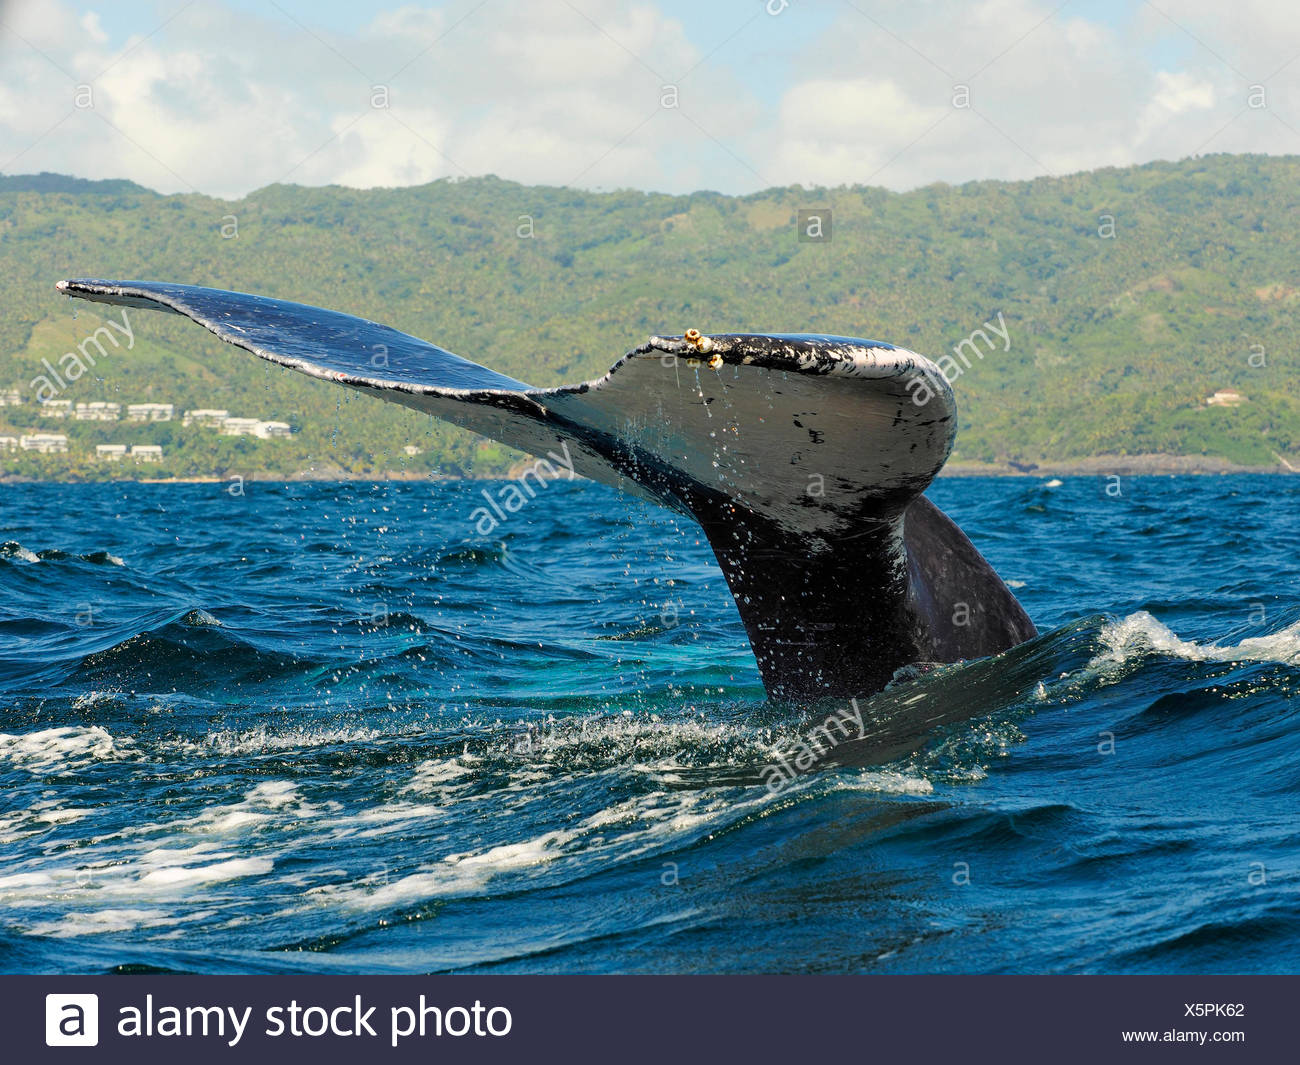 humpback whale (Megaptera novaeangliae), tail fin, Dominican Republic, Samana - Stock Image